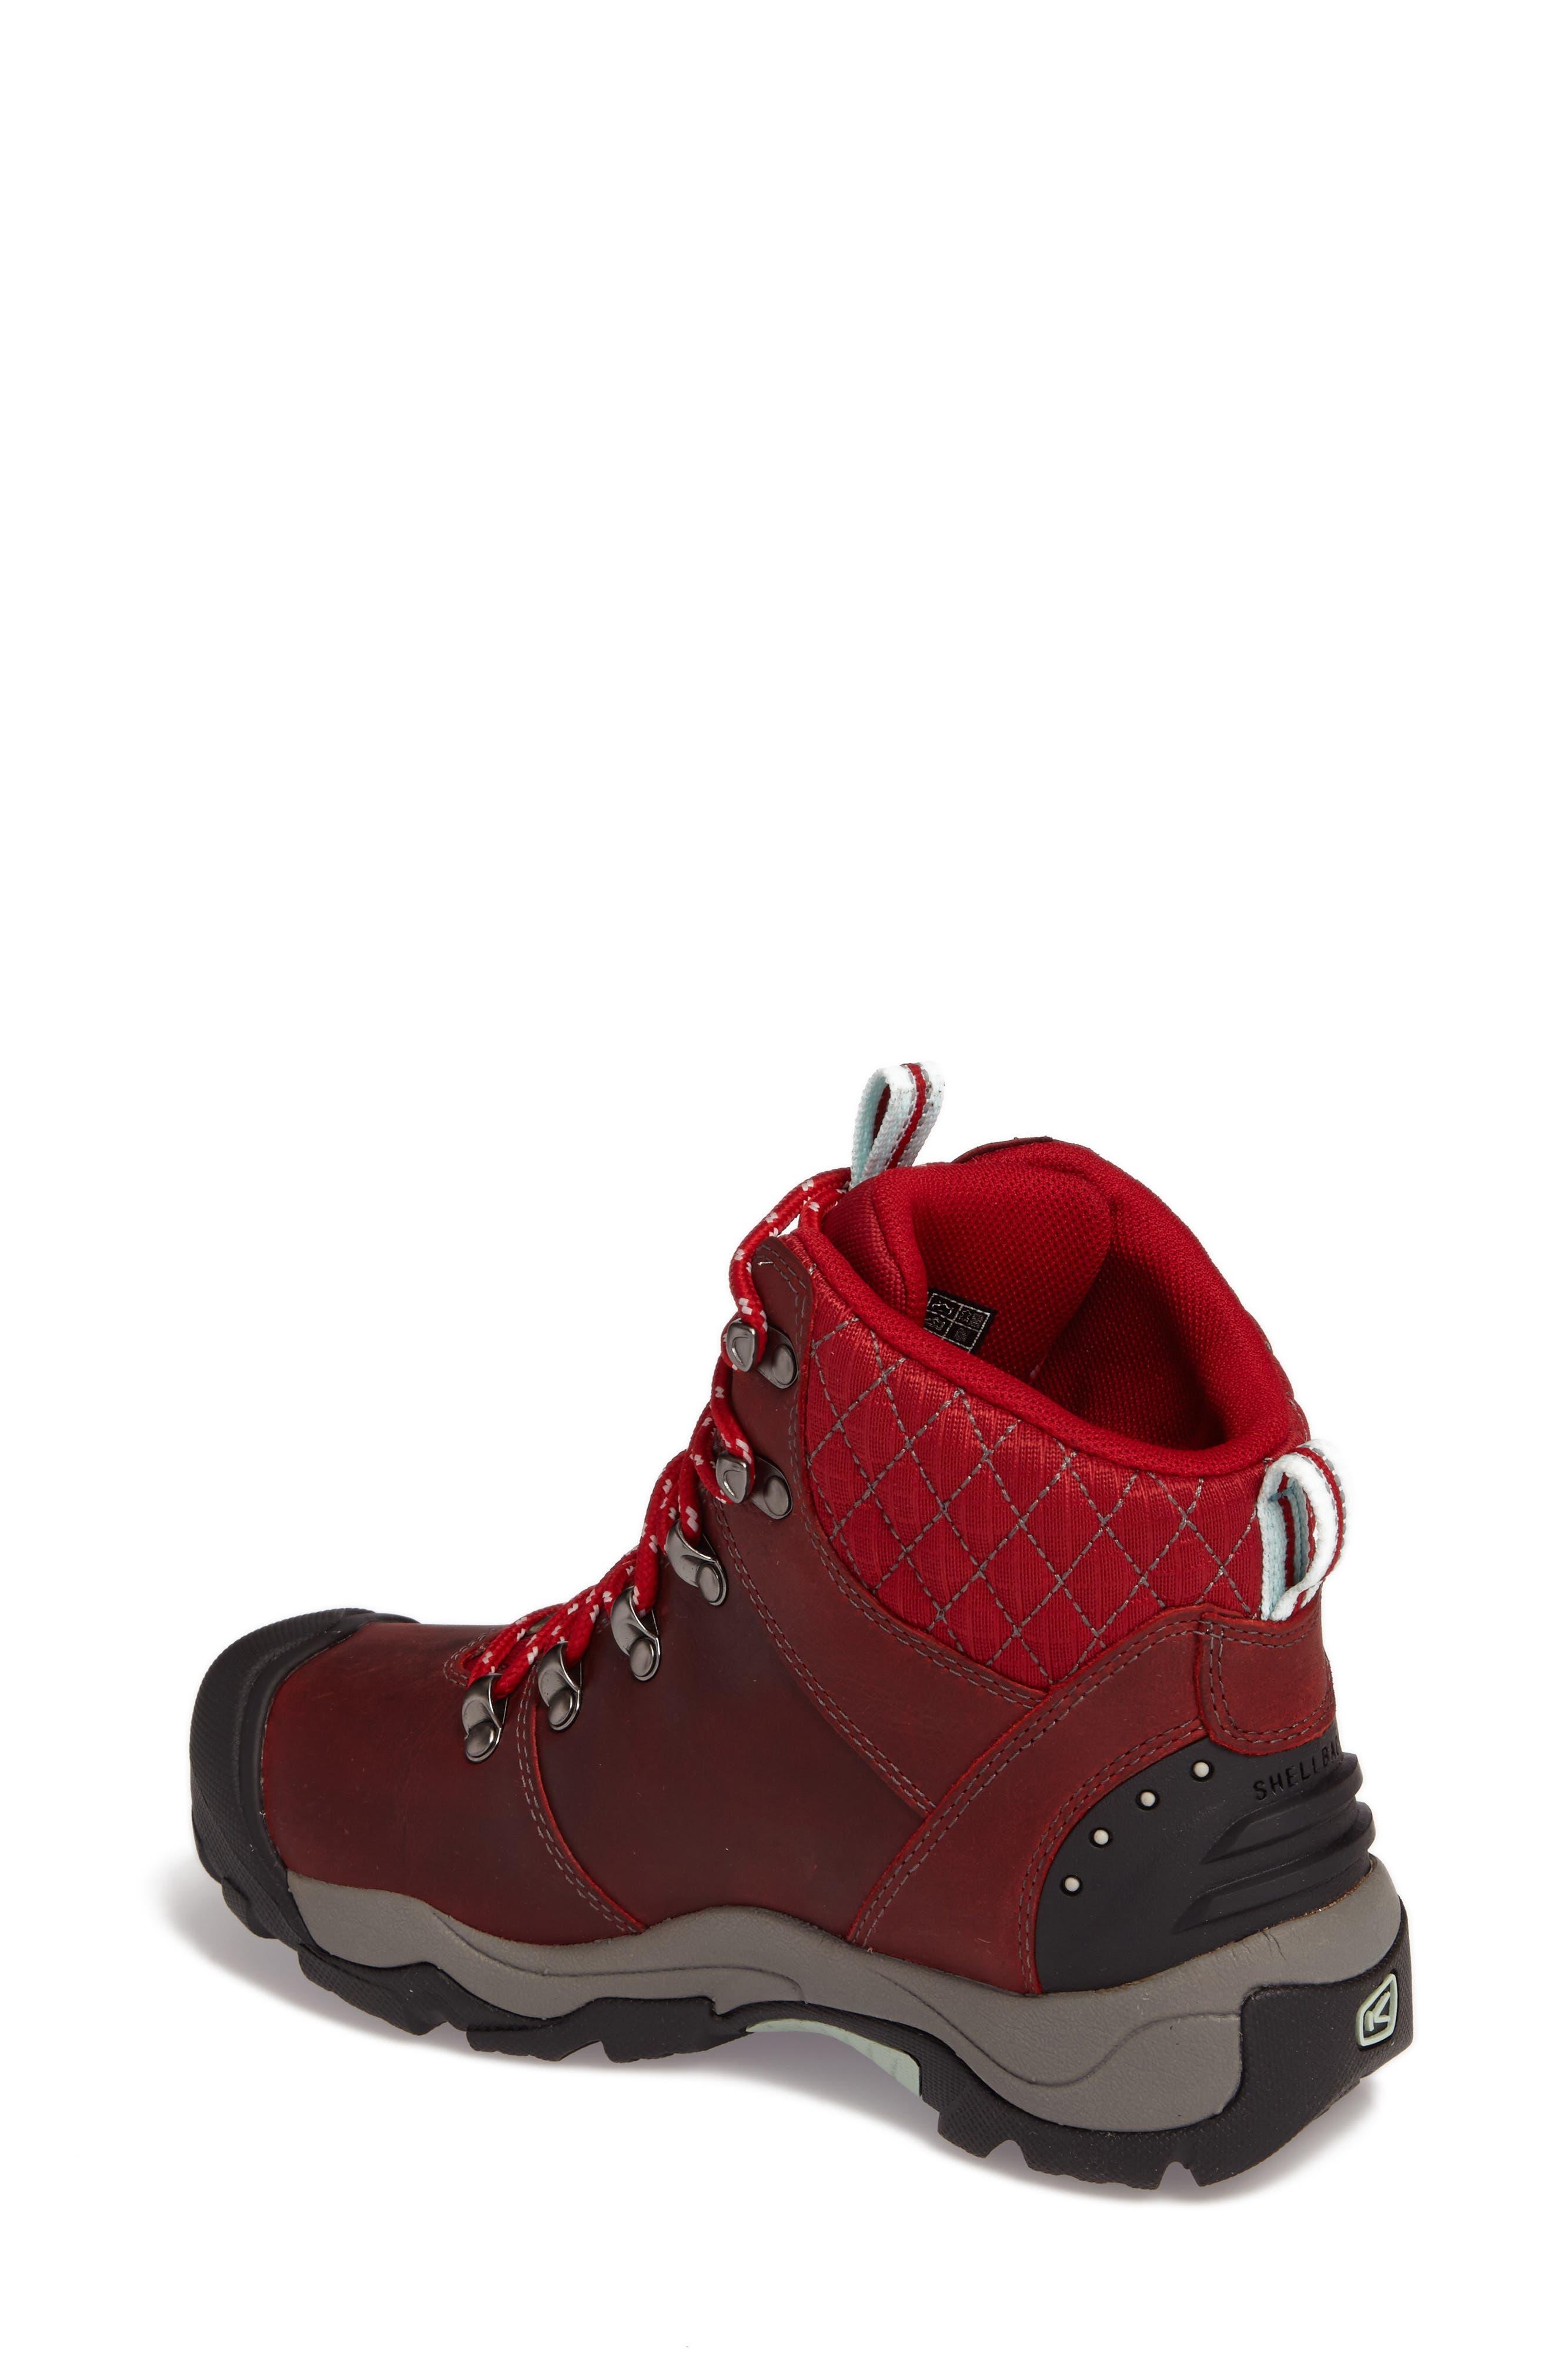 Revel III Waterproof Hiking Boot,                             Alternate thumbnail 4, color,